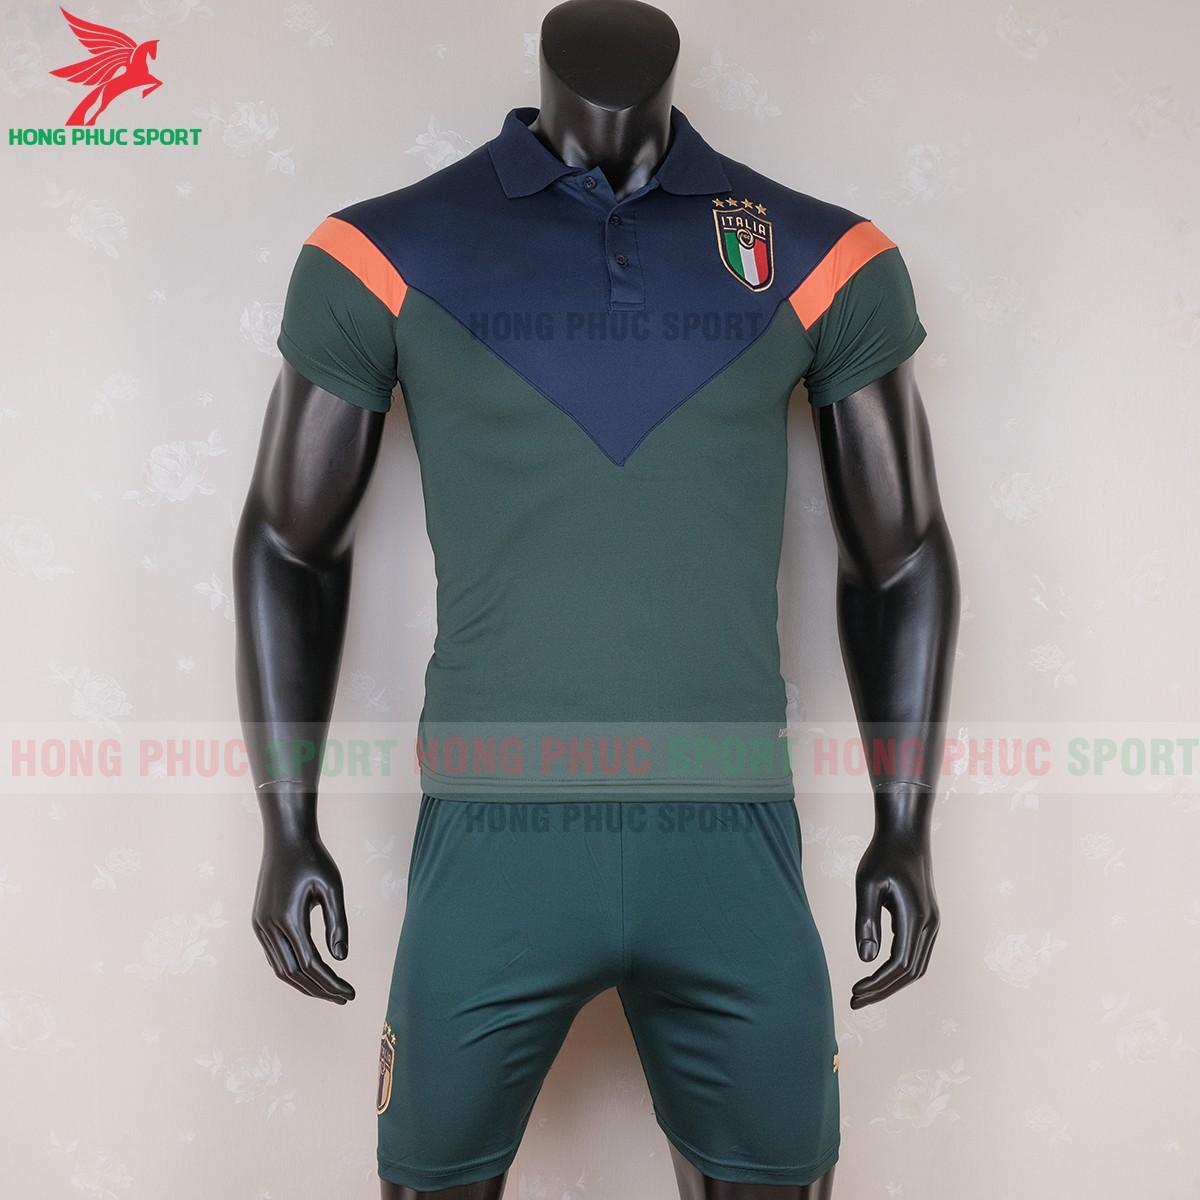 https://cdn.hongphucsport.com/unsafe/s4.shopbay.vn/files/285/ao-polo-tuyen-italia-2020-1-5f73e3af7d875.png